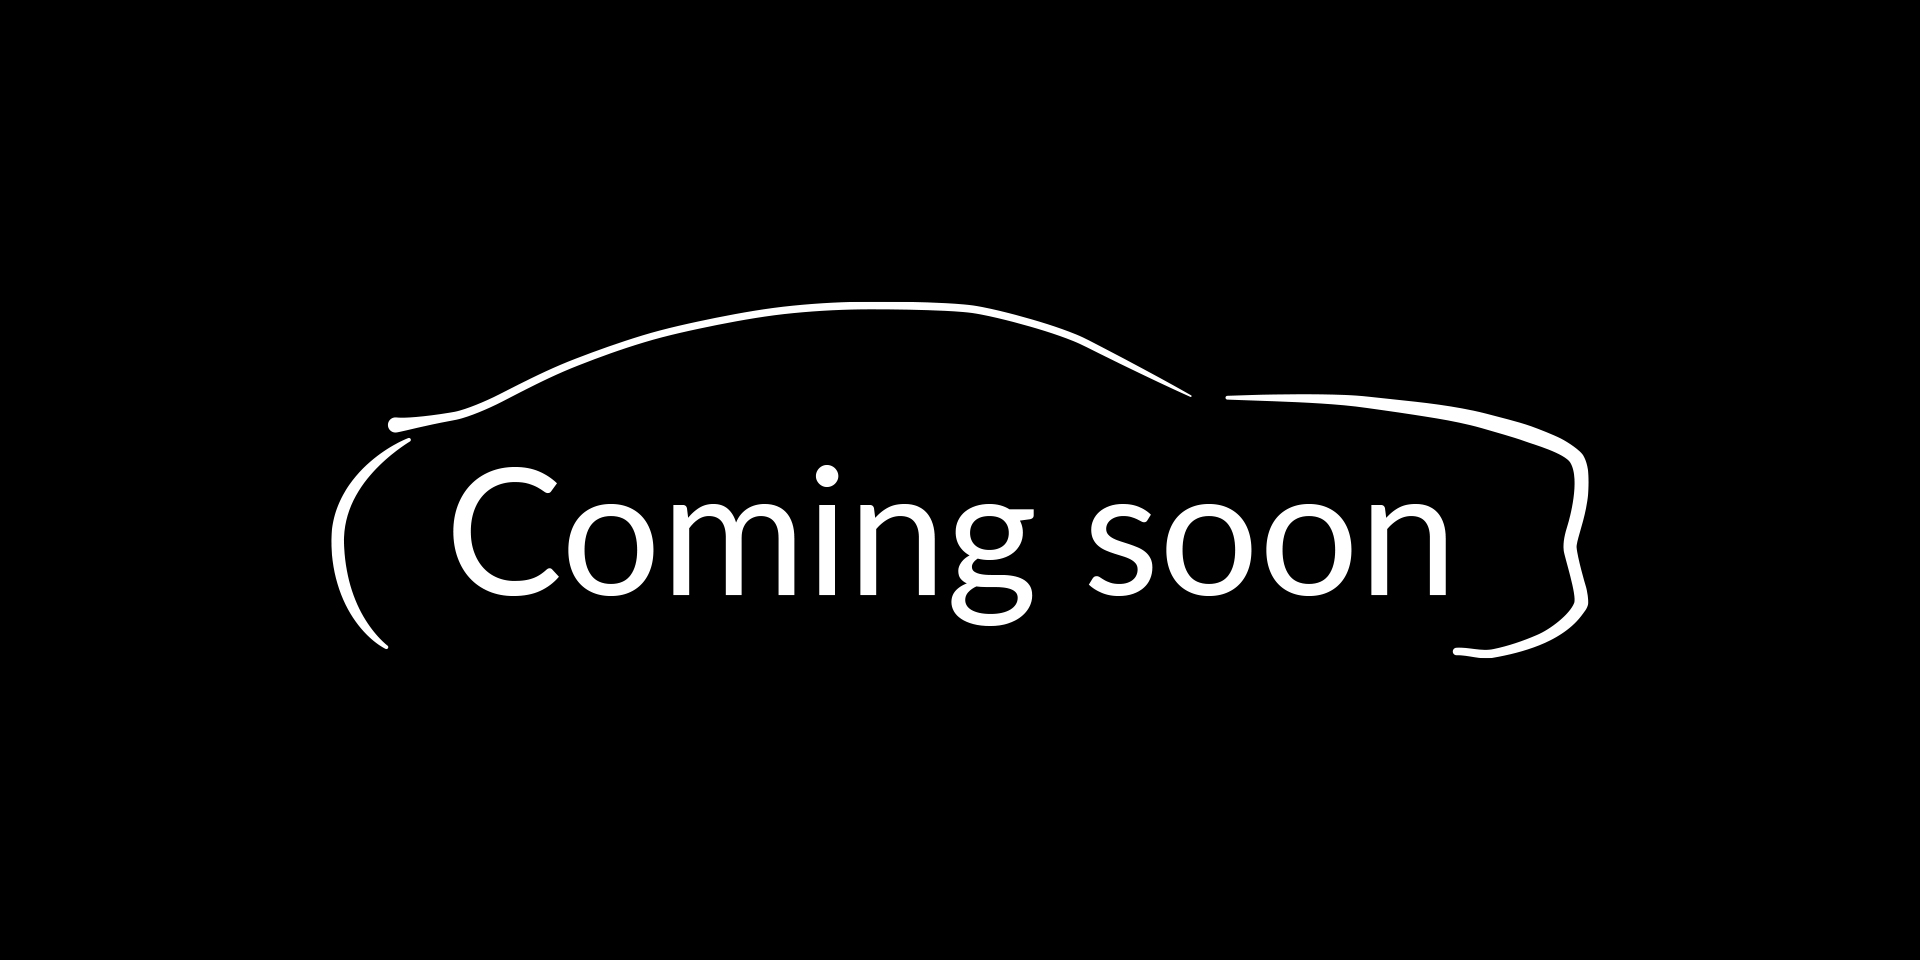 Coming soon | Expert Ratings